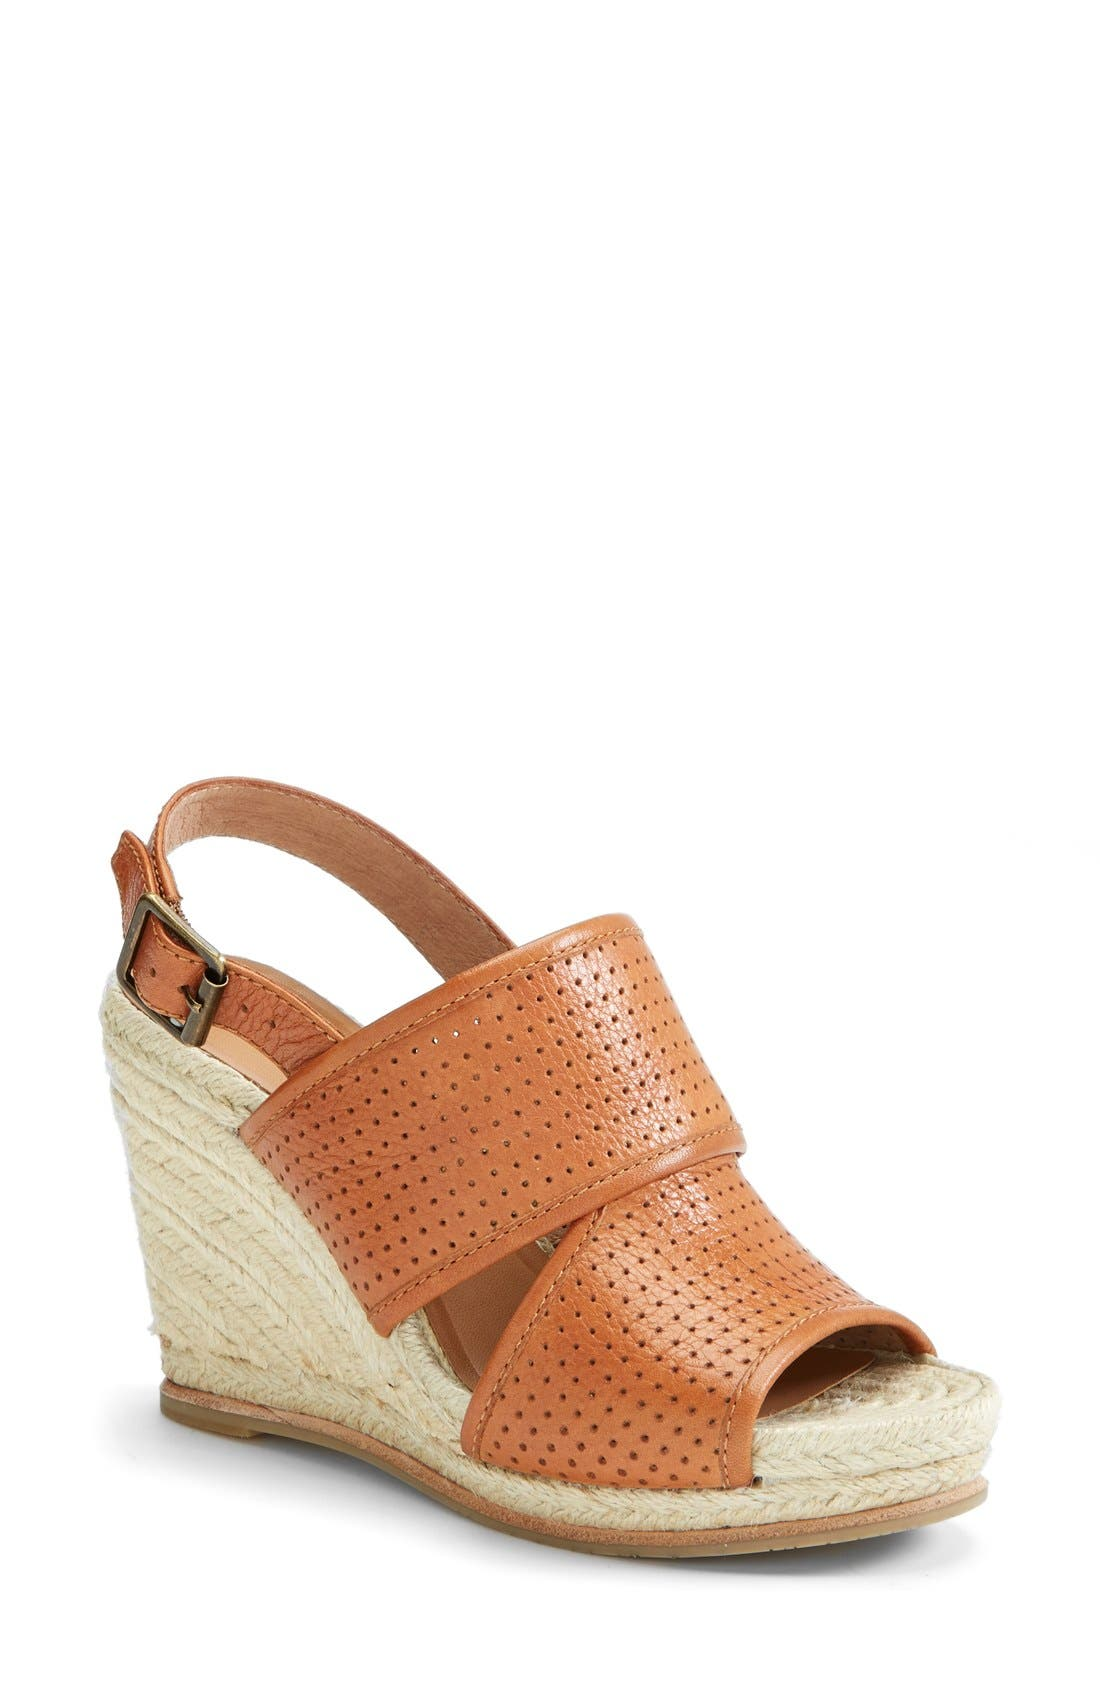 'Joyce' Perforated Espadrille Wedge Sandal,                             Main thumbnail 1, color,                             Brown